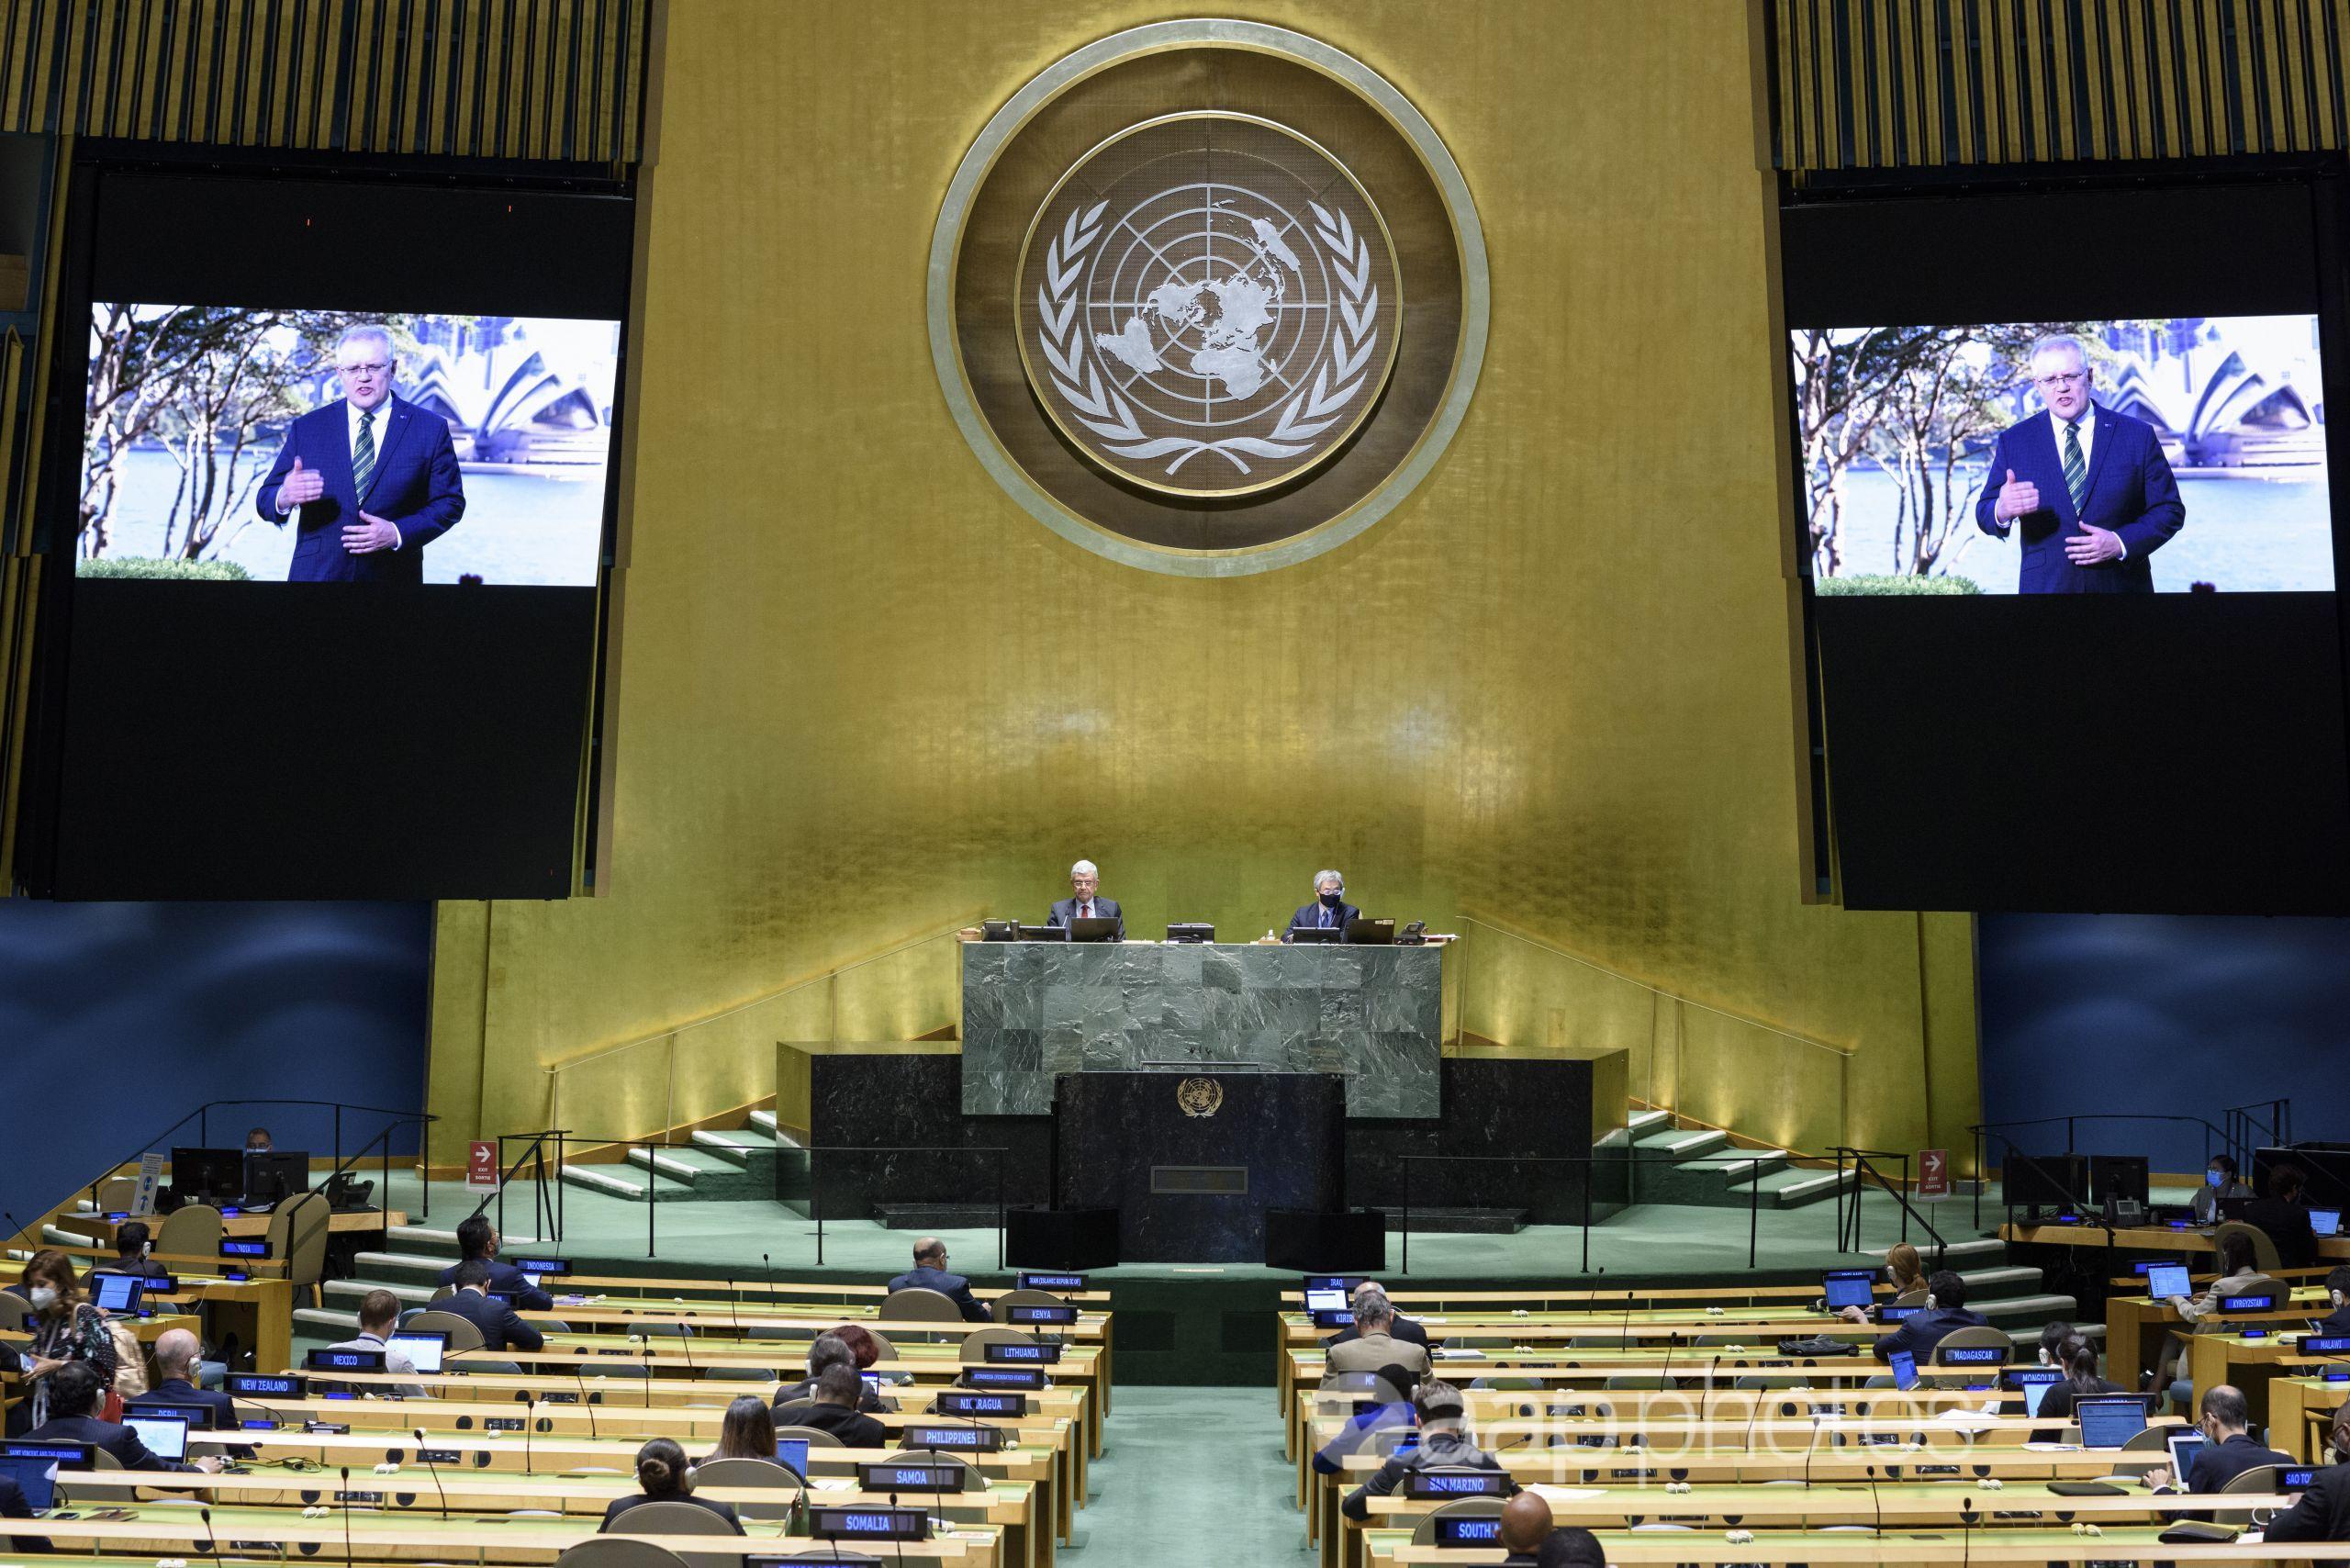 Scott Morrison speaks at the United Nations General Assembly.